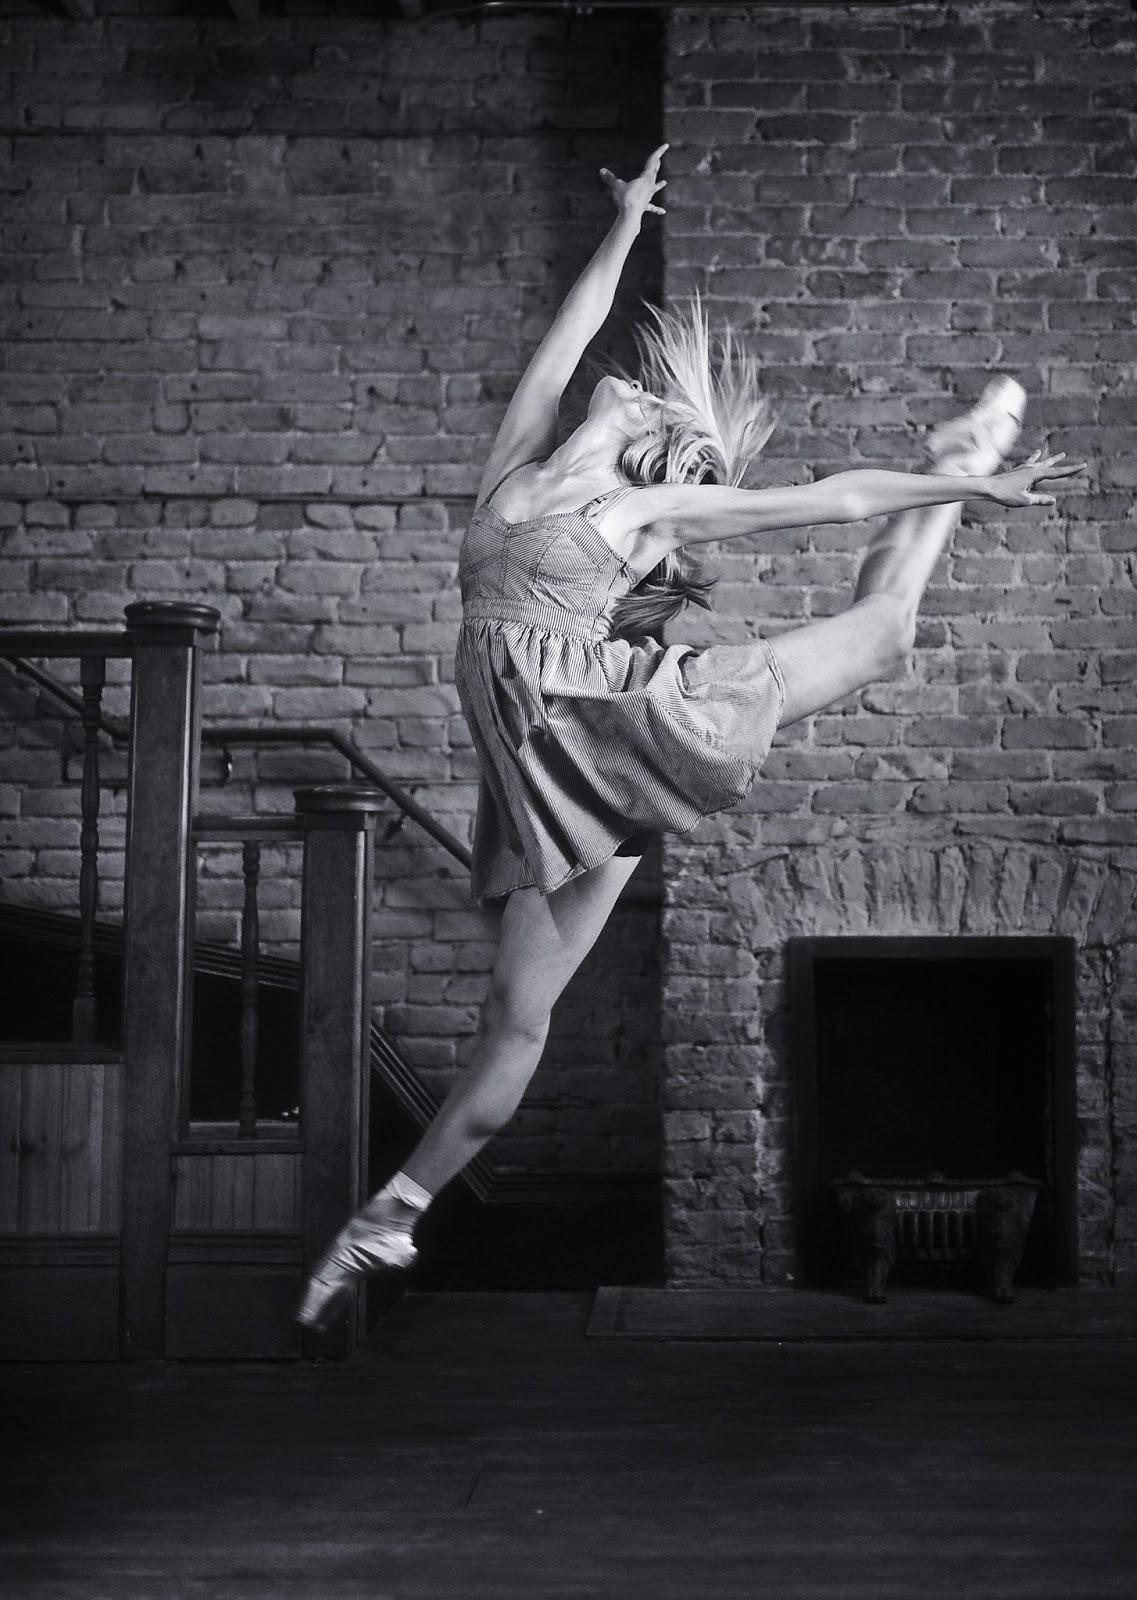 """Freestyle Ballerina"" ballerina project, Boise. By Mike Reid."